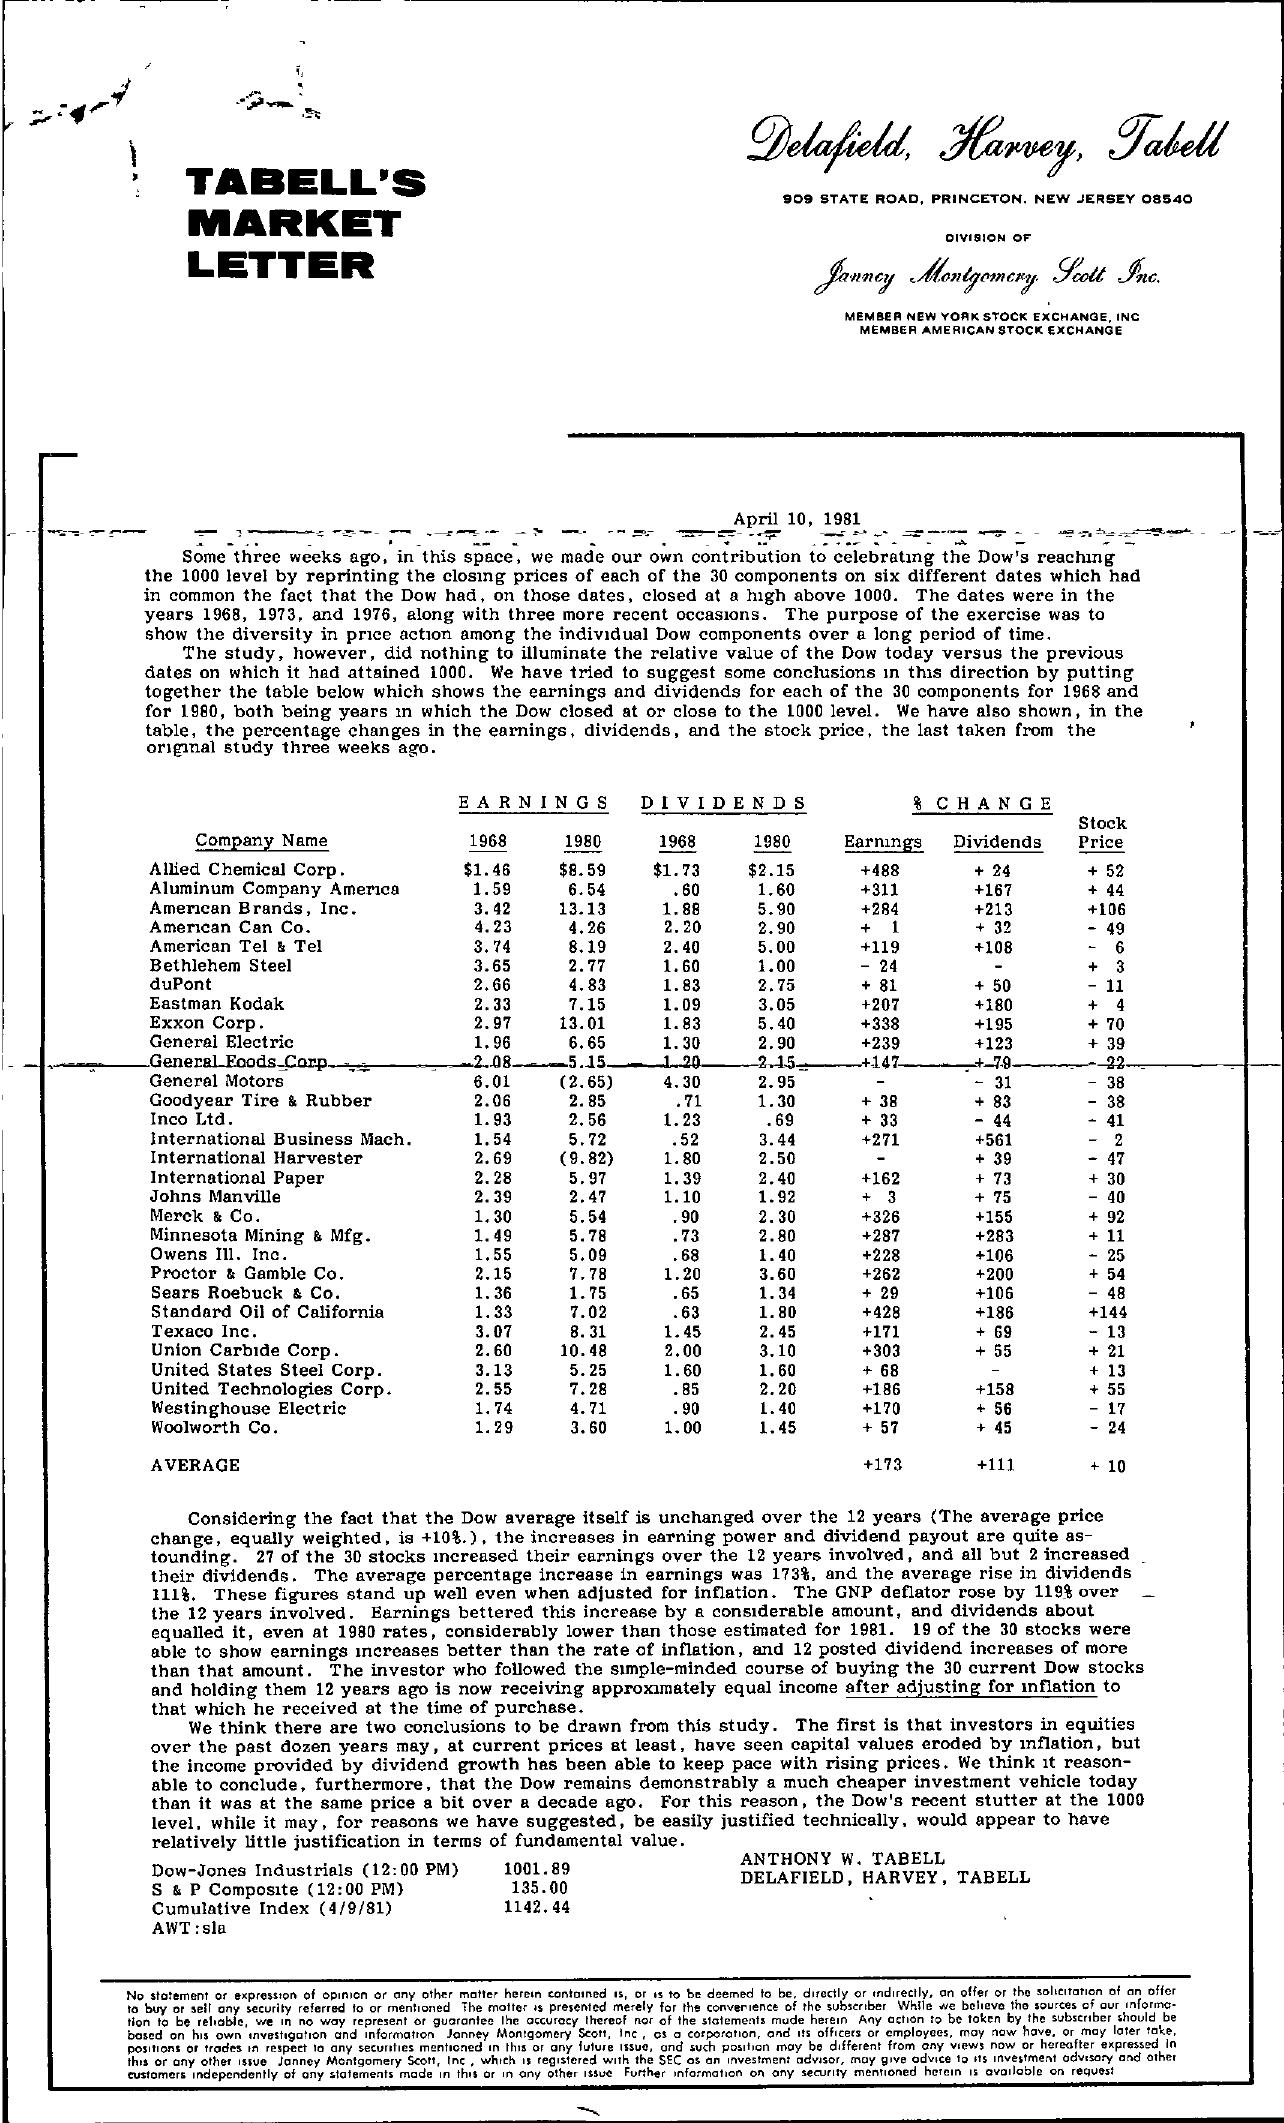 Tabell's Market Letter - April 10, 1981